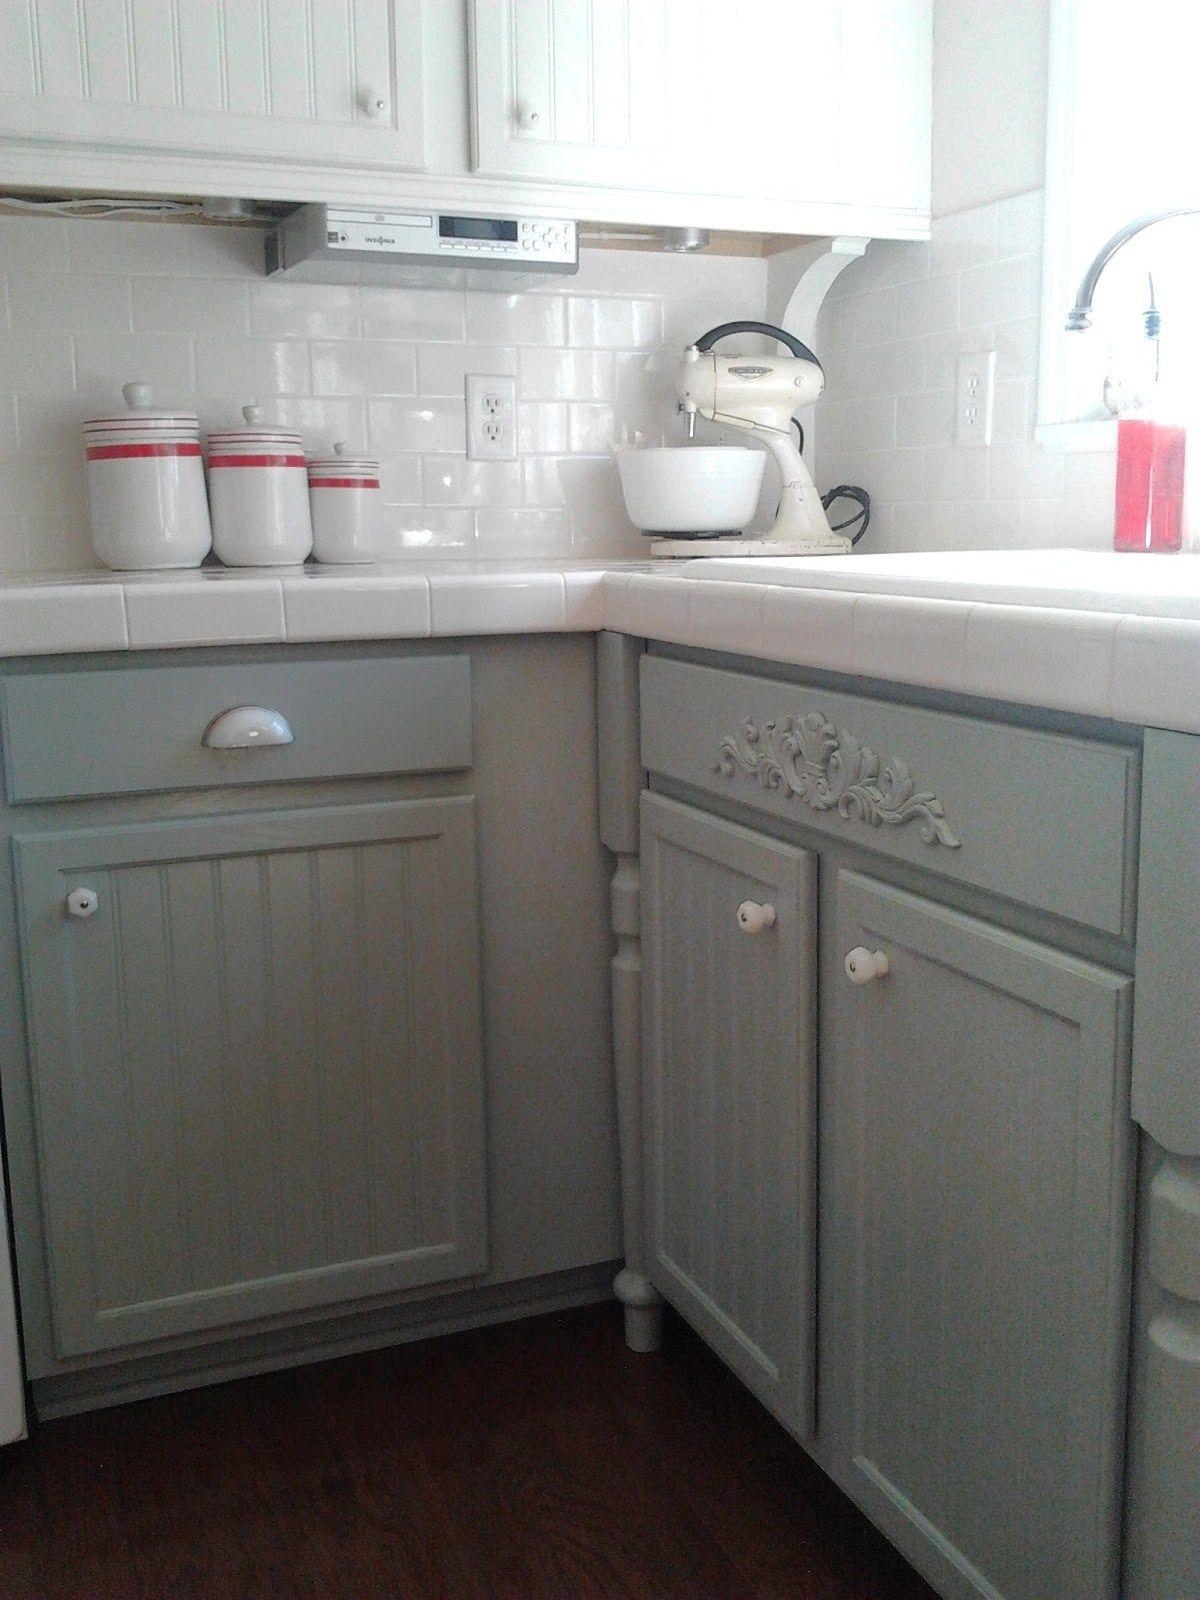 9 Kitchen Cabinet Update Oak To Gray Paint Silver Mink By Benjamin Moore Milk Gla Kitchen Cabinets Painted Grey Painting Oak Cabinets White Kitchen Makeover